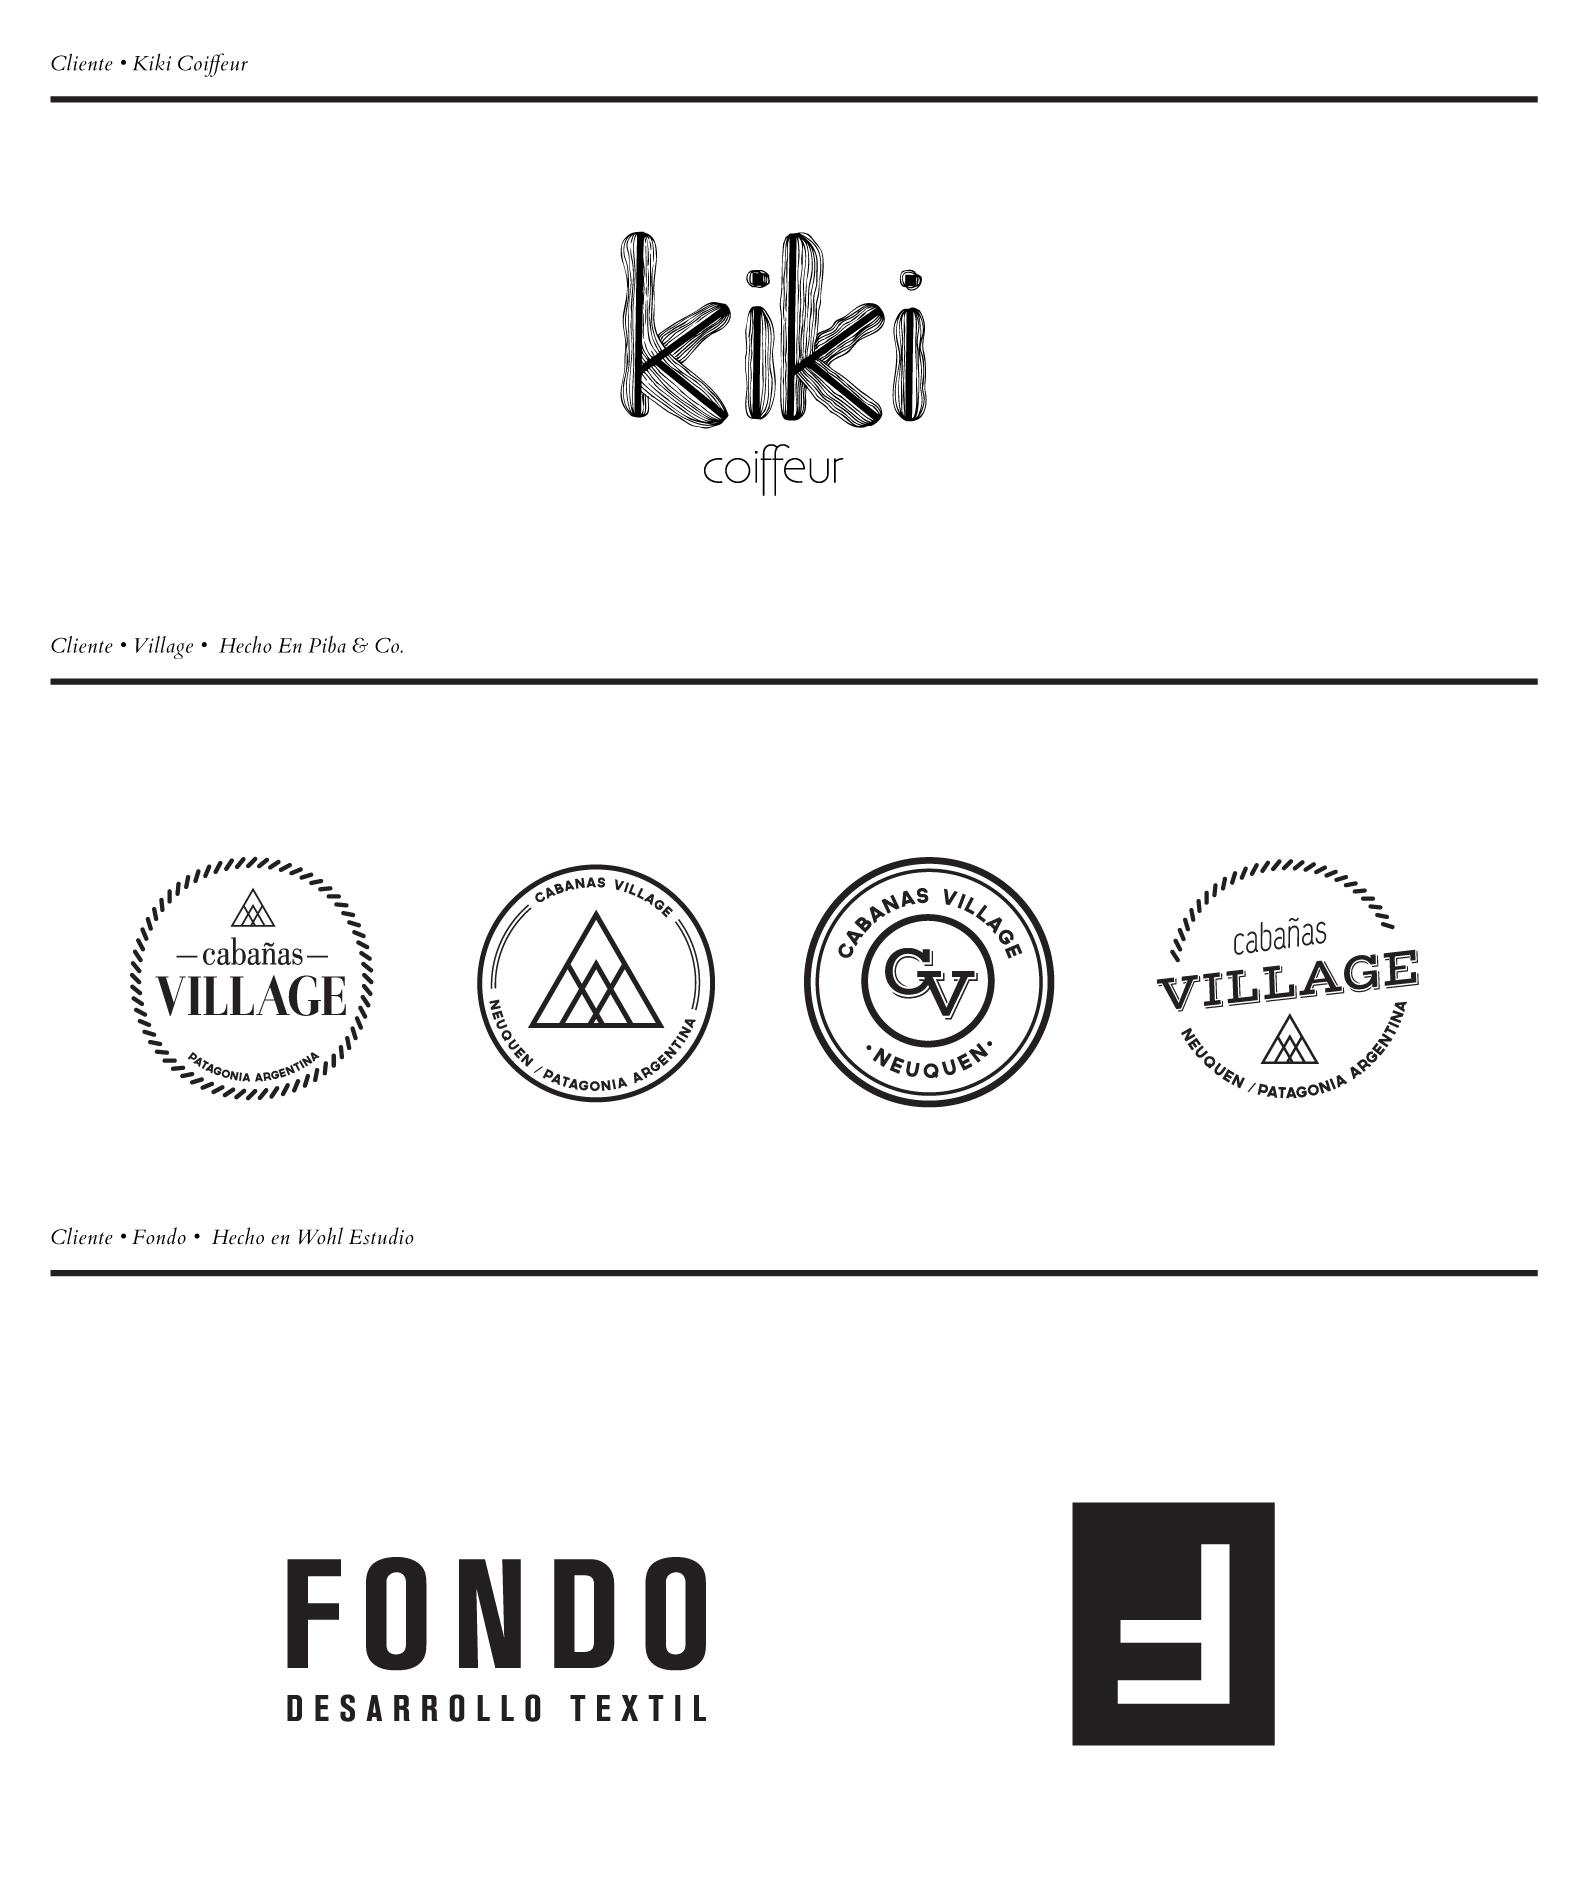 logos-2-v2-06